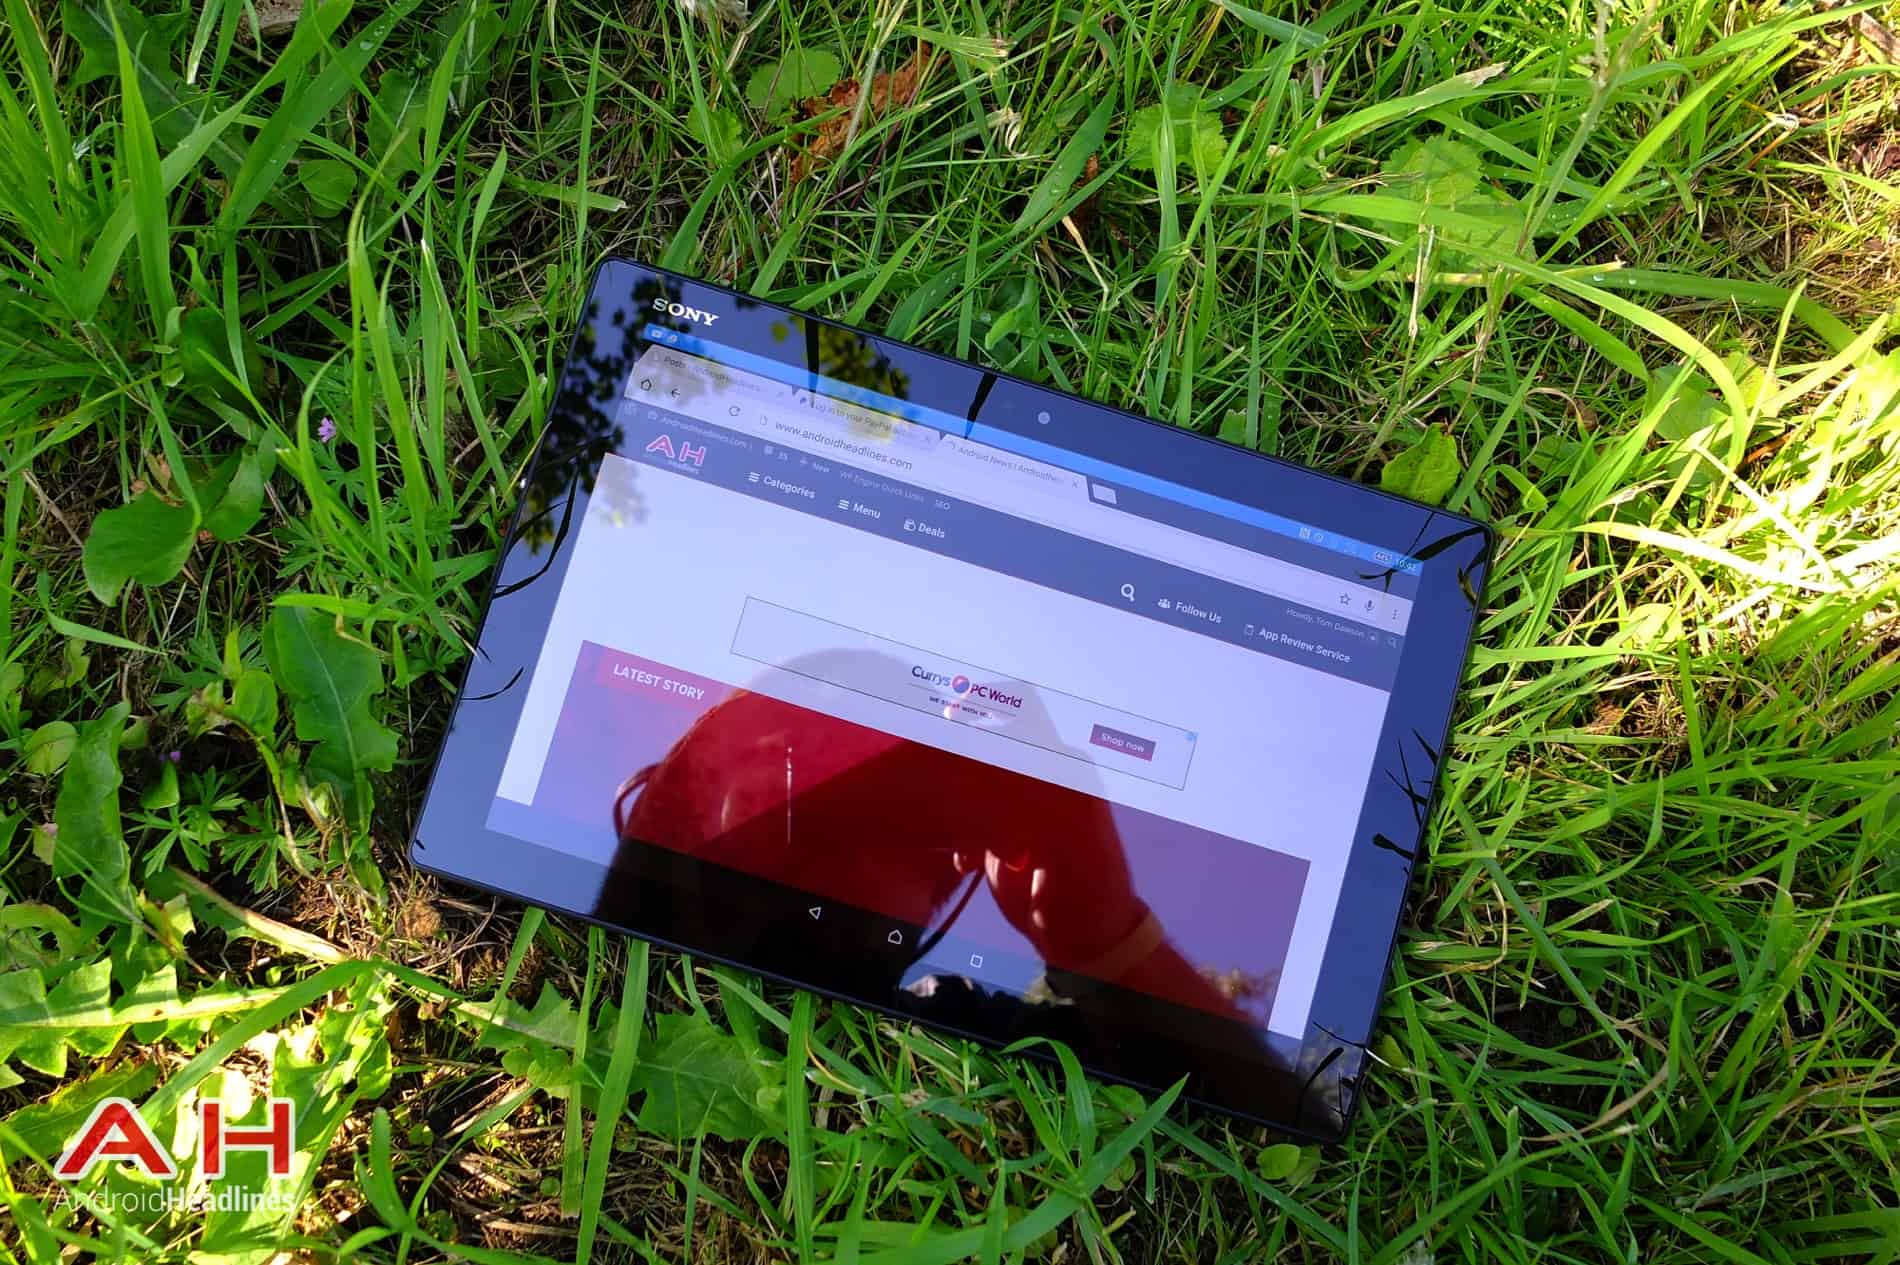 Xperia Z4 Tablet AH 04